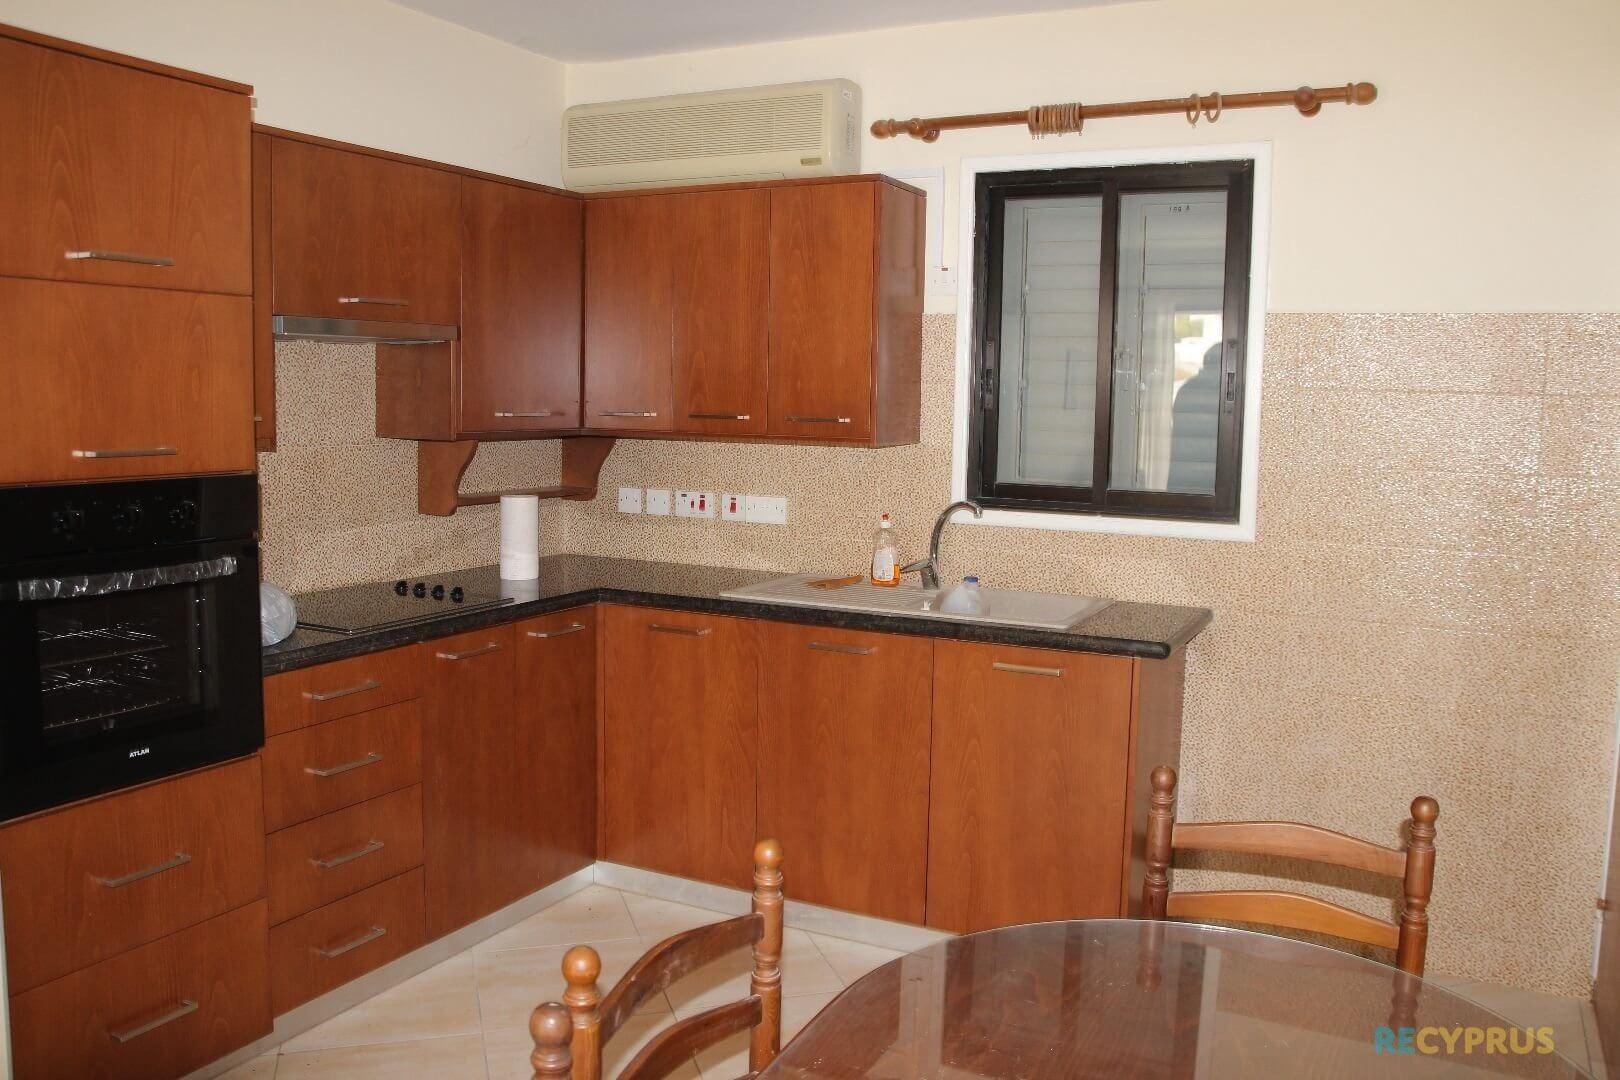 Apartment for sale Kapparis Famagusta Cyprus 2 3559